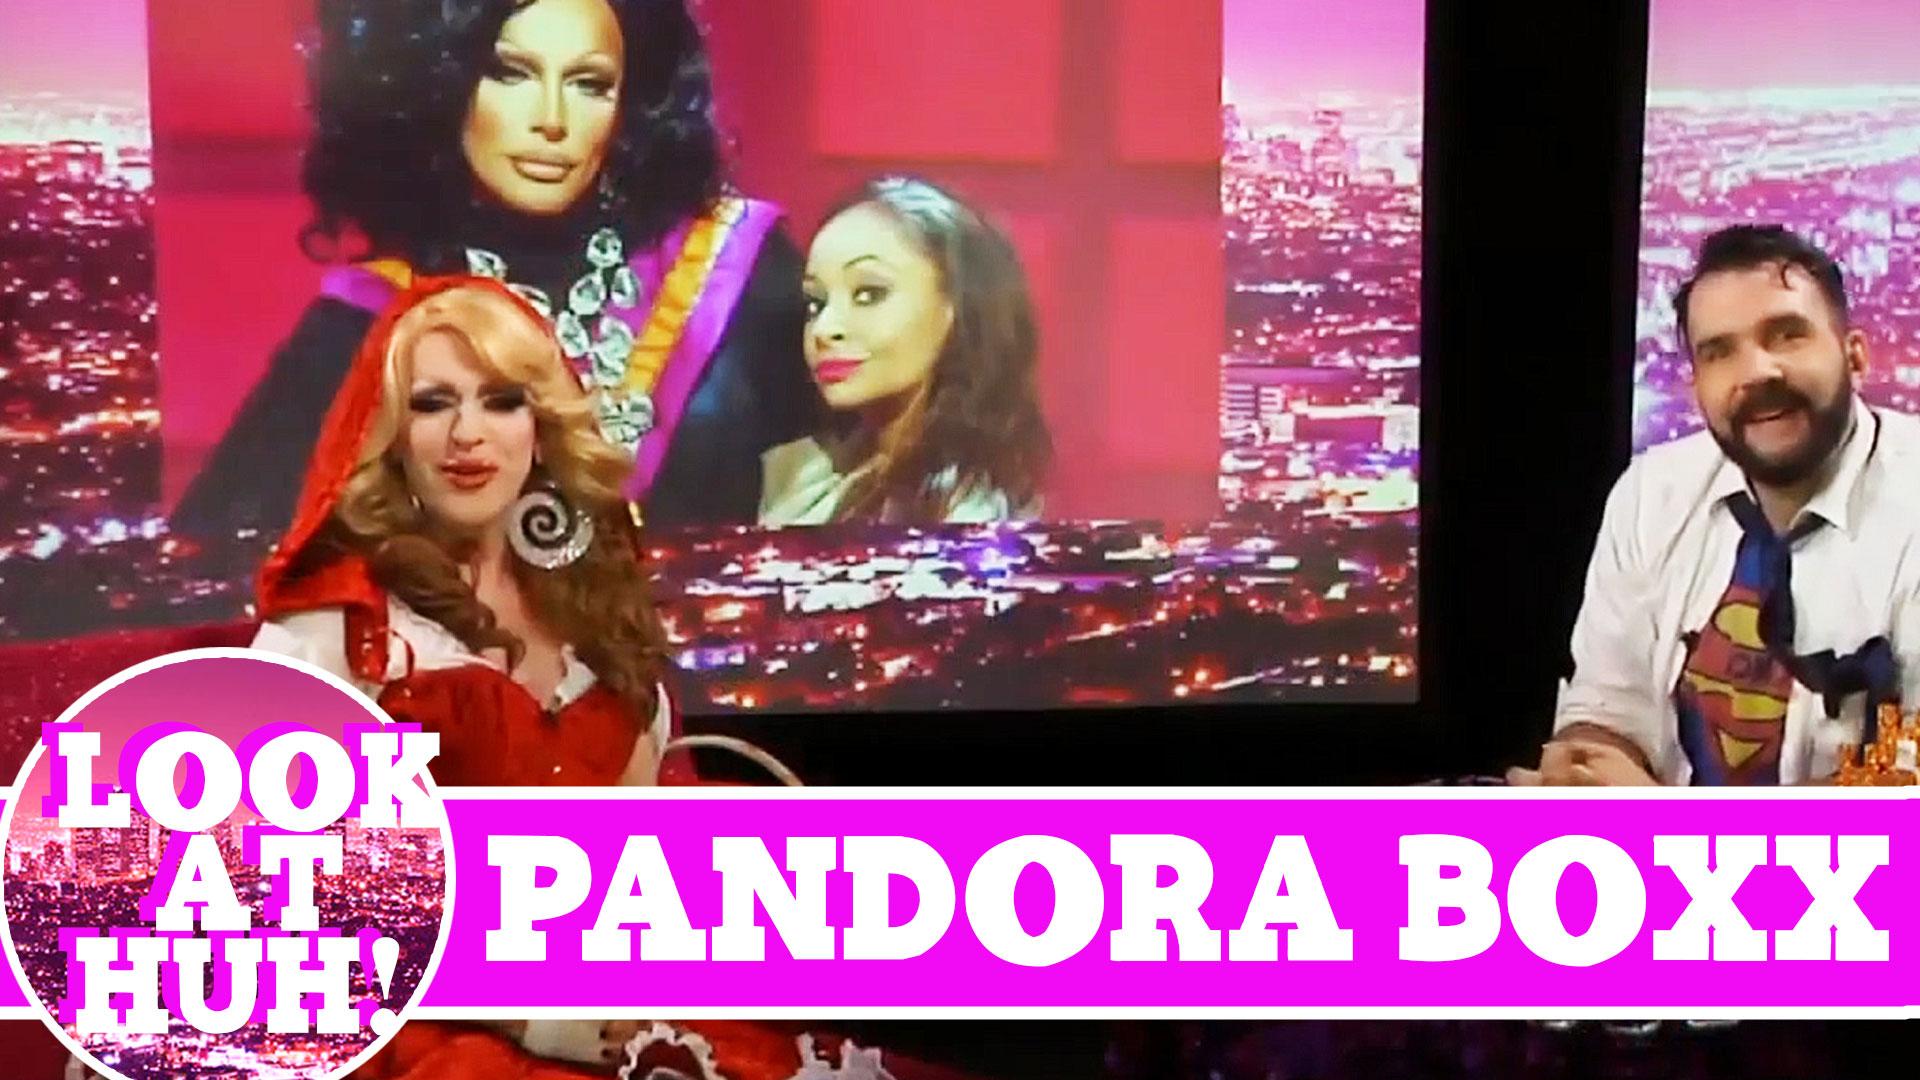 Pandora Boxx LOOK AT HUH! On Hey Qween with Jonny McGovern